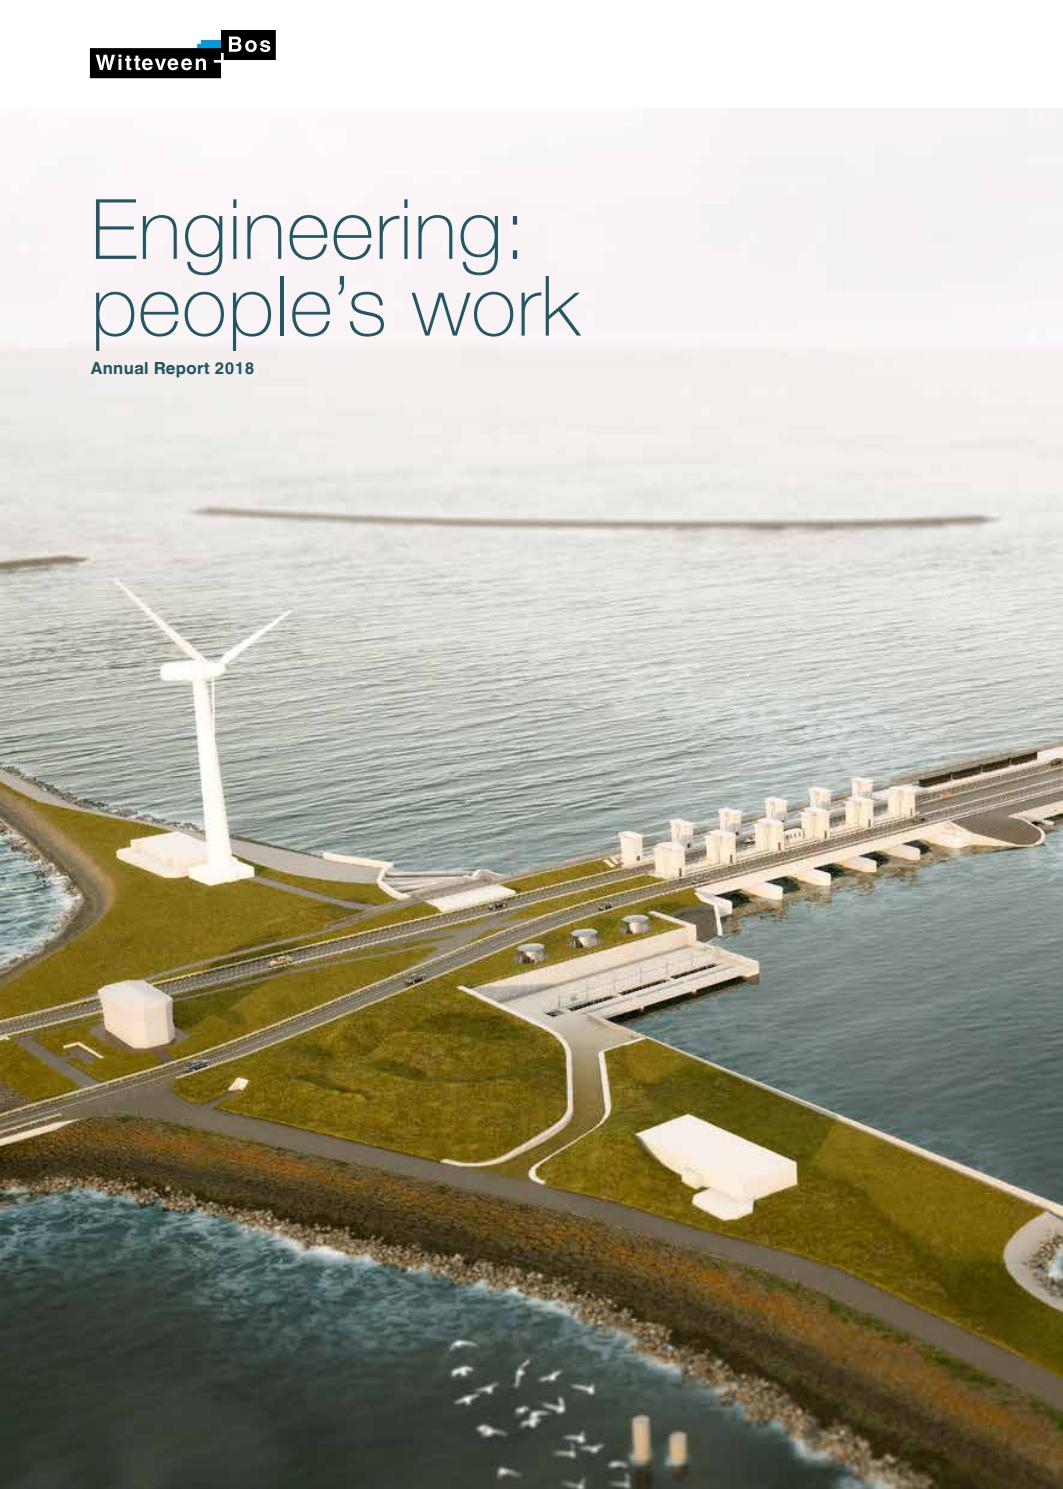 Witteveen+Bos Annual Report 2018 by Witteveen+Bos - issuu